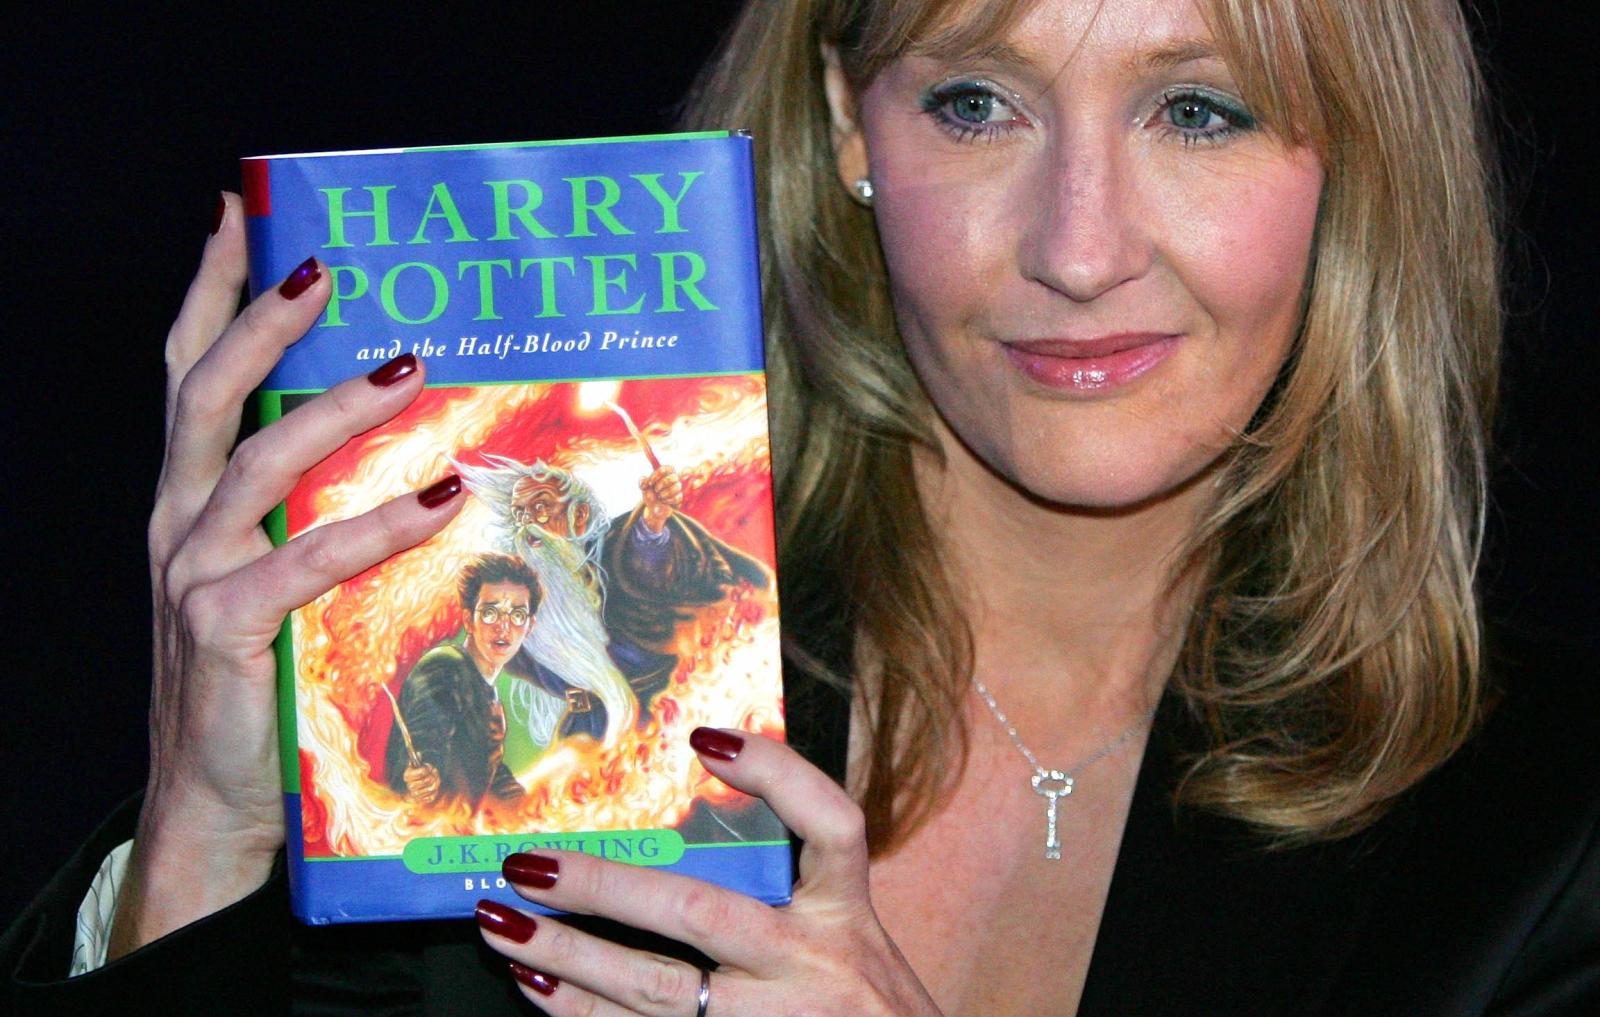 J.K. Rowling Writing Style